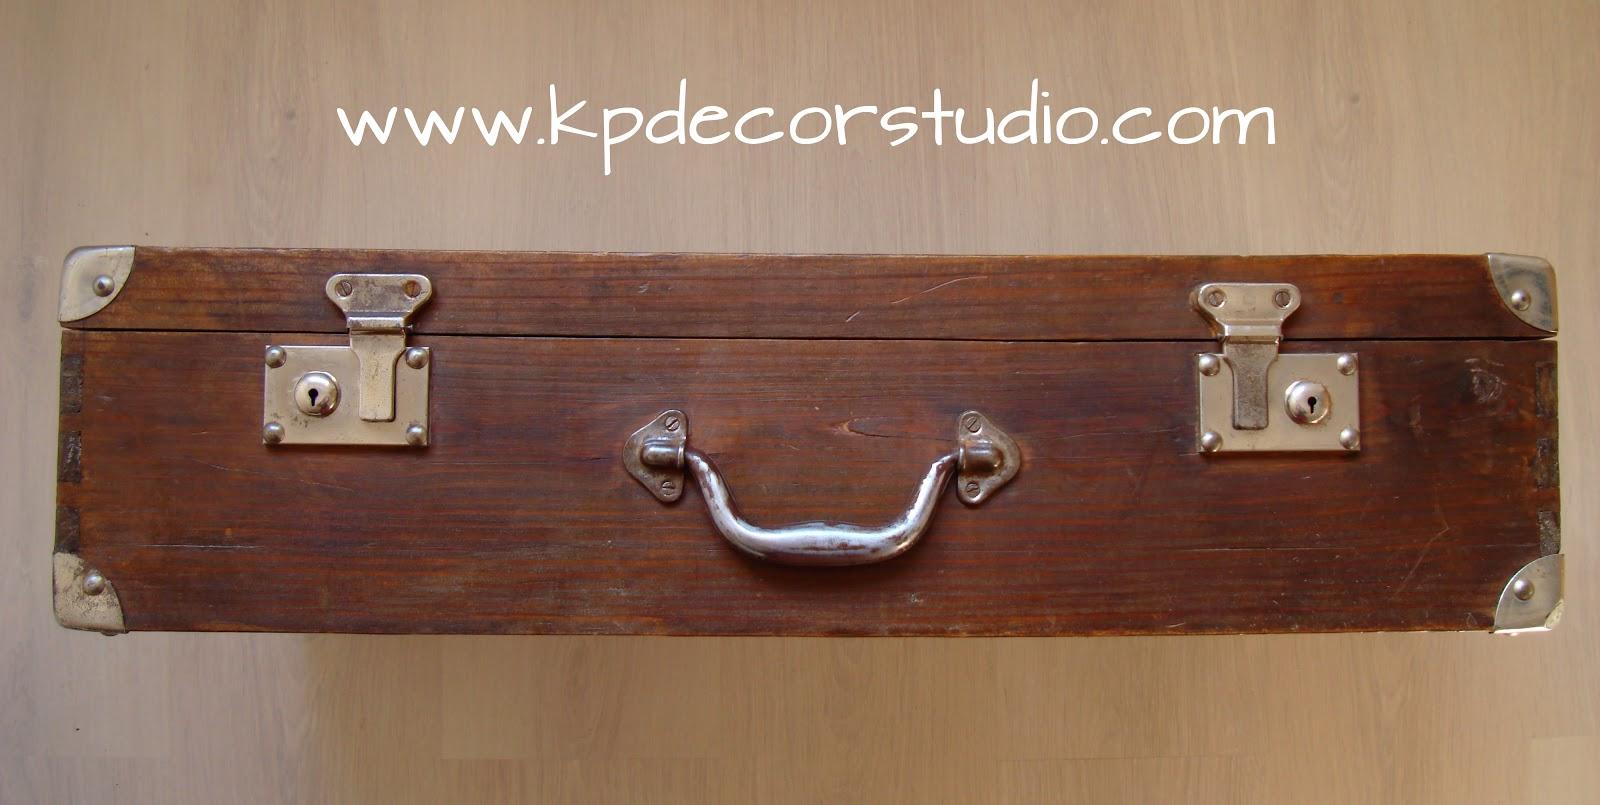 Tiendas De Muebles Segunda Mano : Kp decor studio maleta de madera antigua old wooden